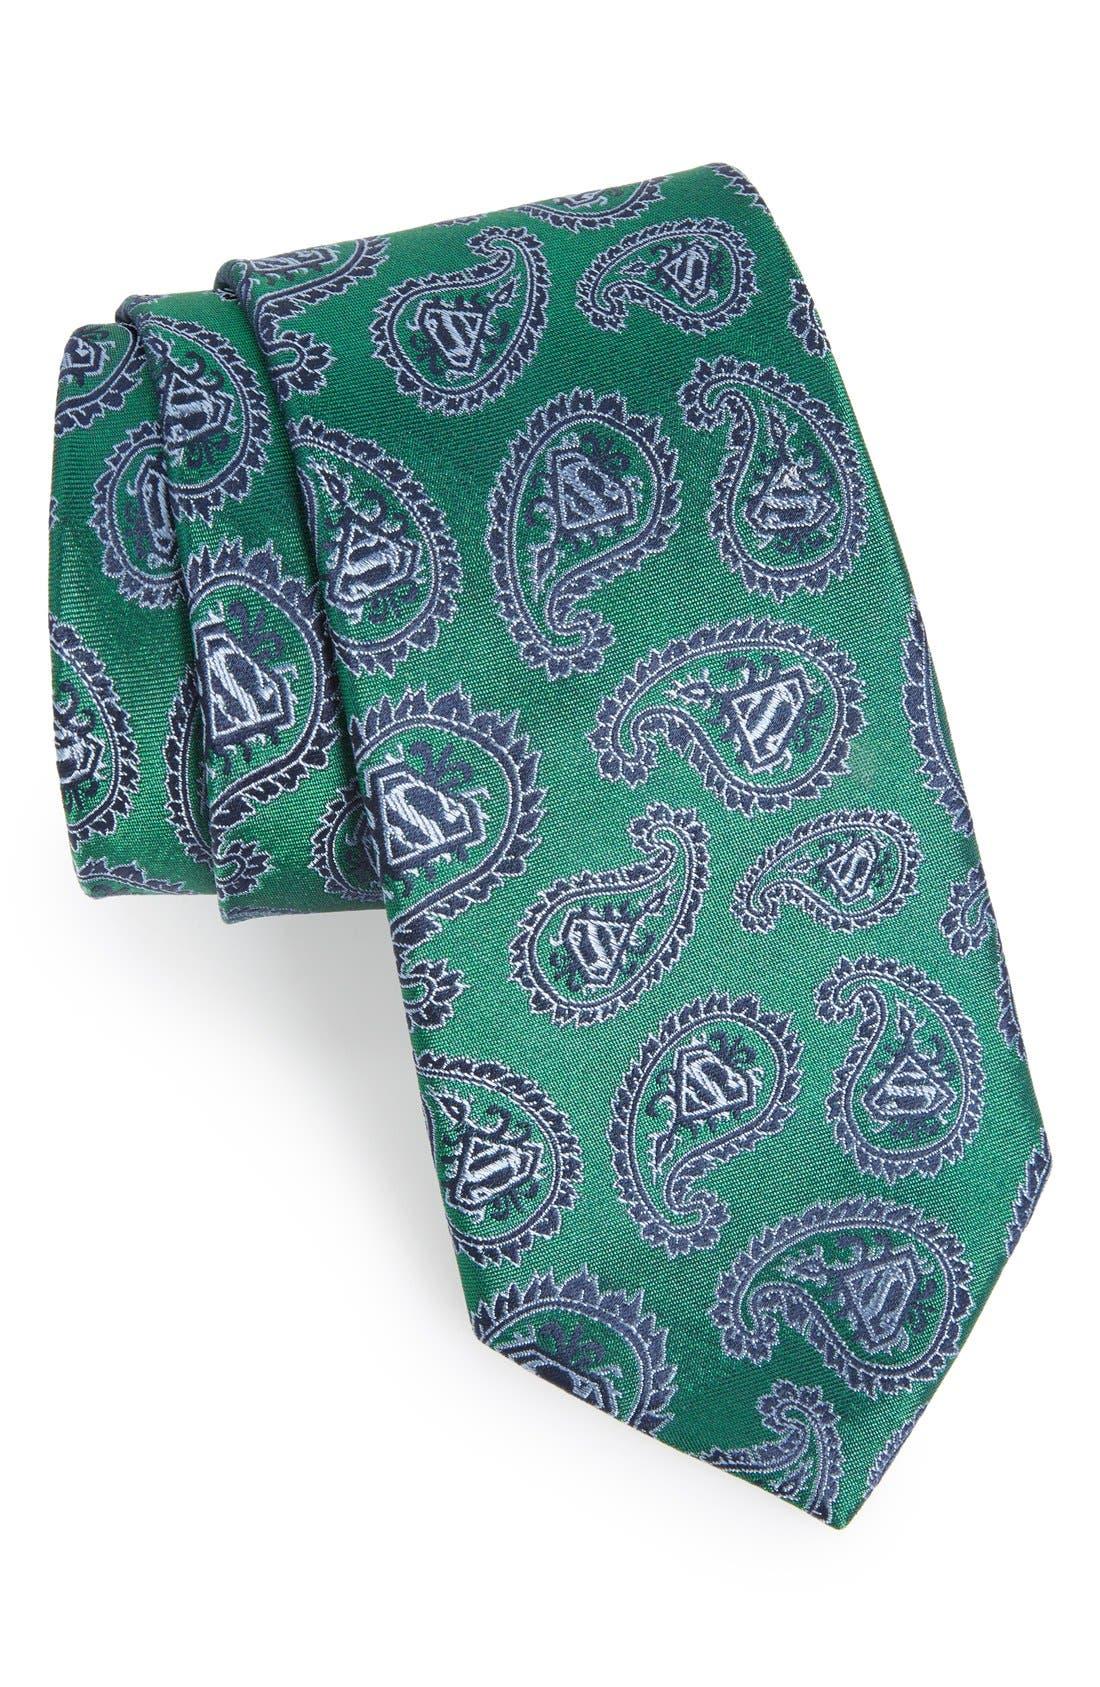 Alternate Image 1 Selected - Cufflinks, Inc. 'Superman' Paisley Silk Tie